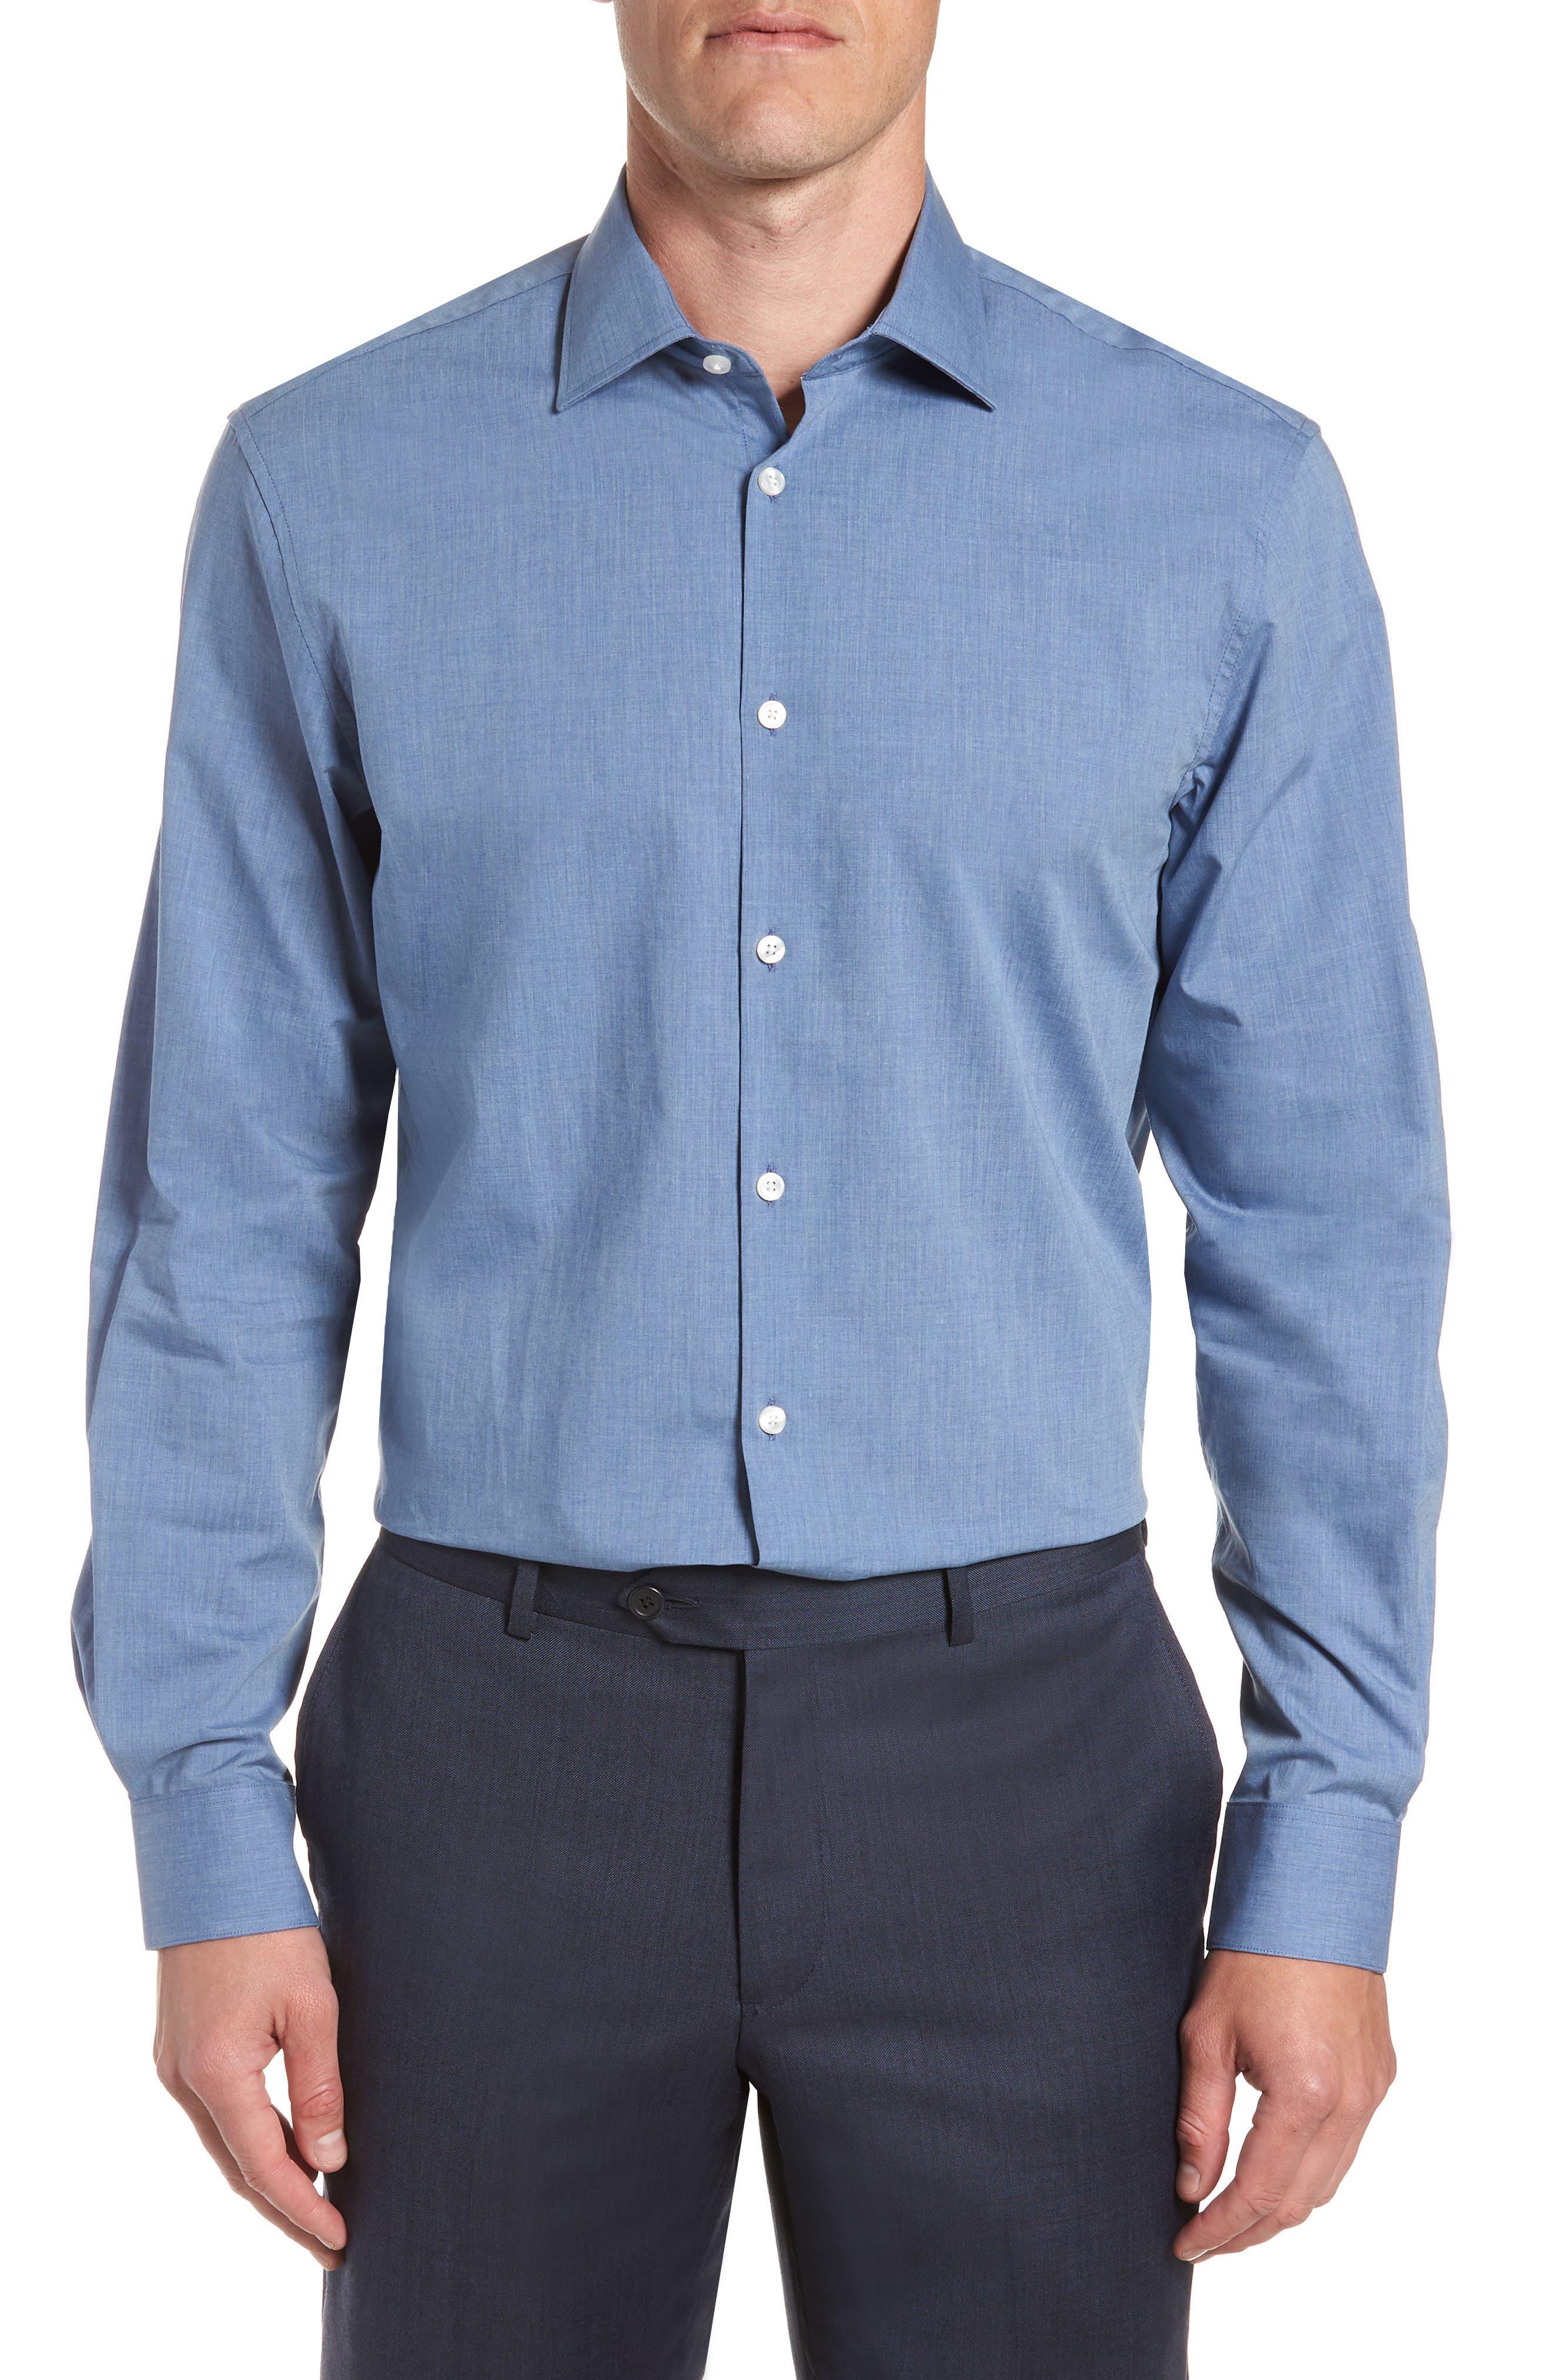 Regular Fit Solid Dress Shirt,                         Main,                         color, BLUE HEATHER